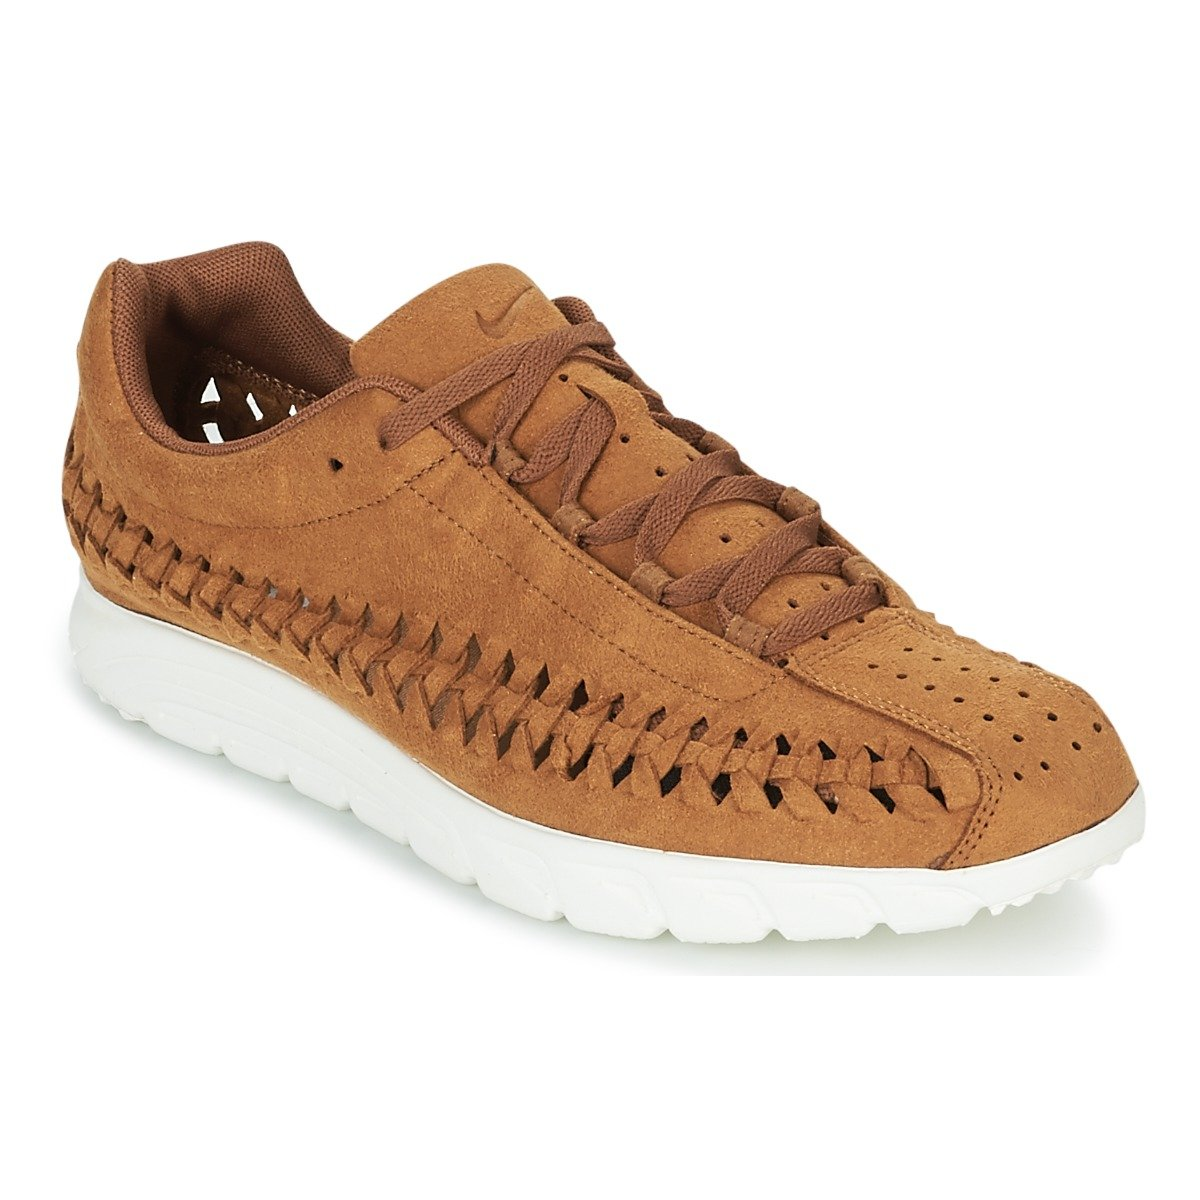 NIKE Men's Mayfly Woven Casual Shoe B07B8RBP8K 11 D(M) US|Ale Brown 202